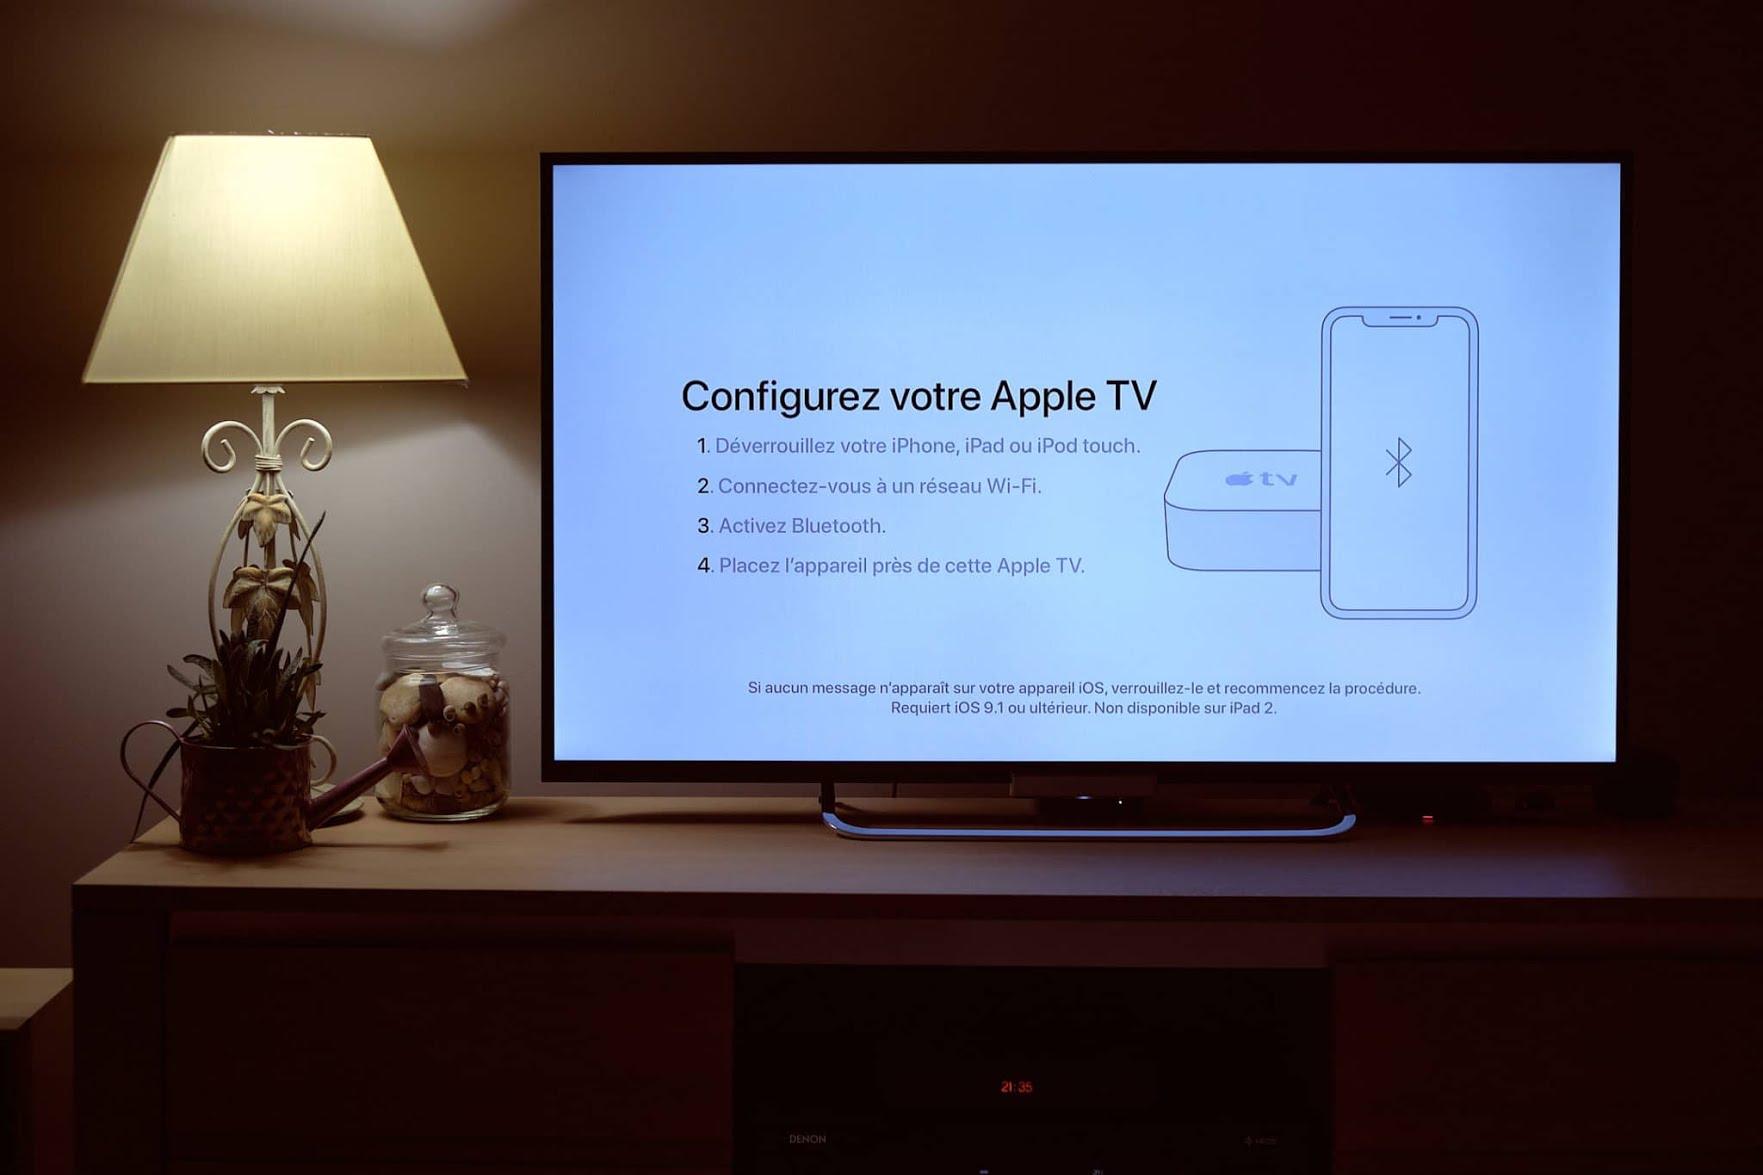 Apple TV 4K une configuration simple